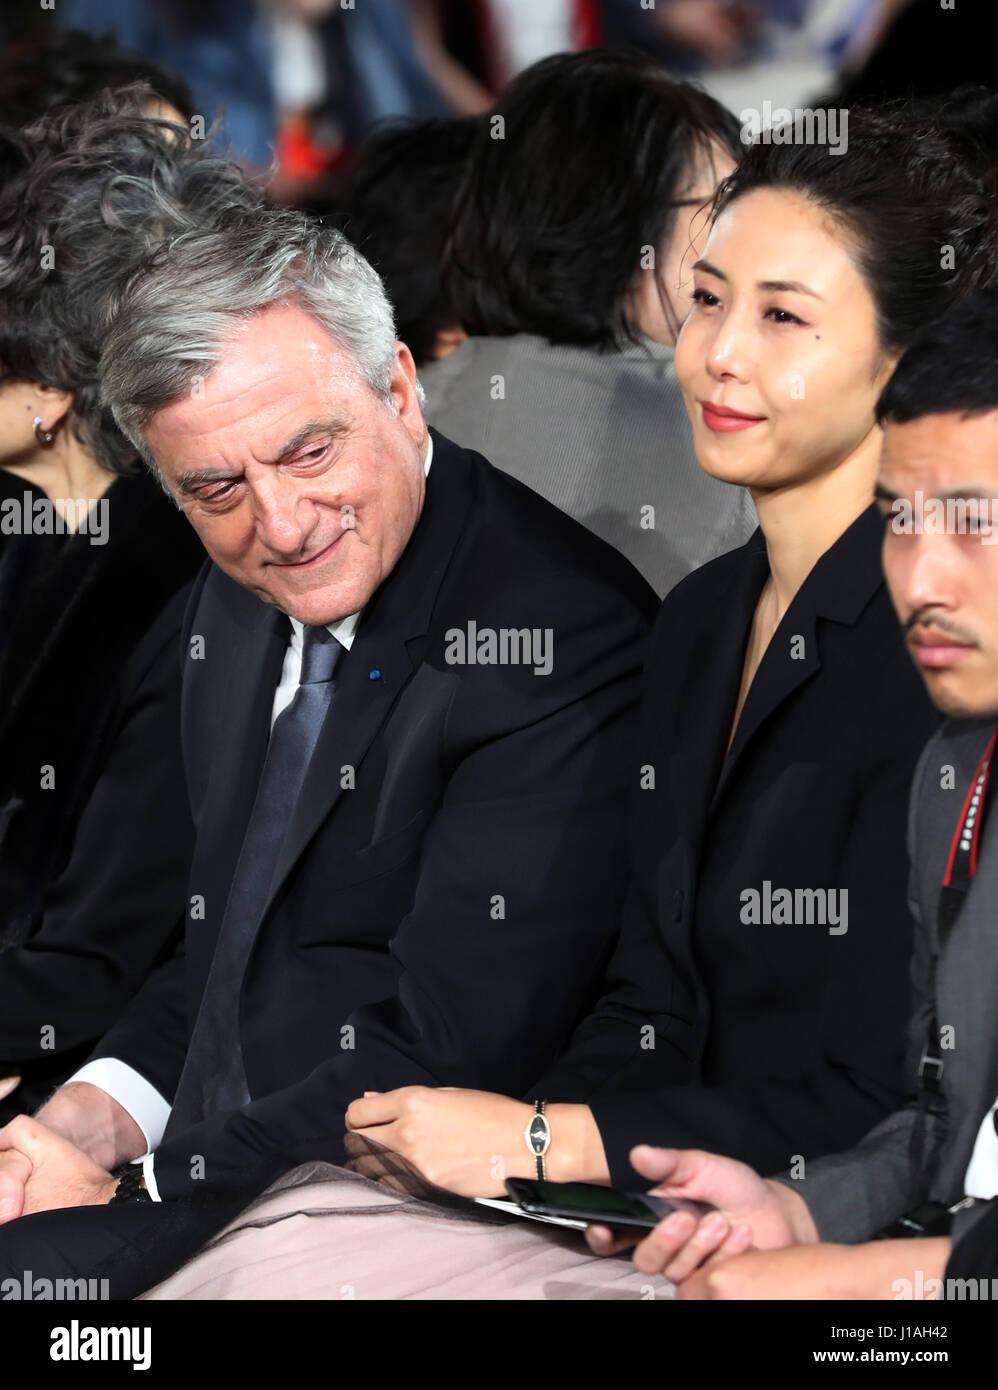 Tokyo, Japan  19th Apr, 2017  French fashion giant Dior CEO Sidney